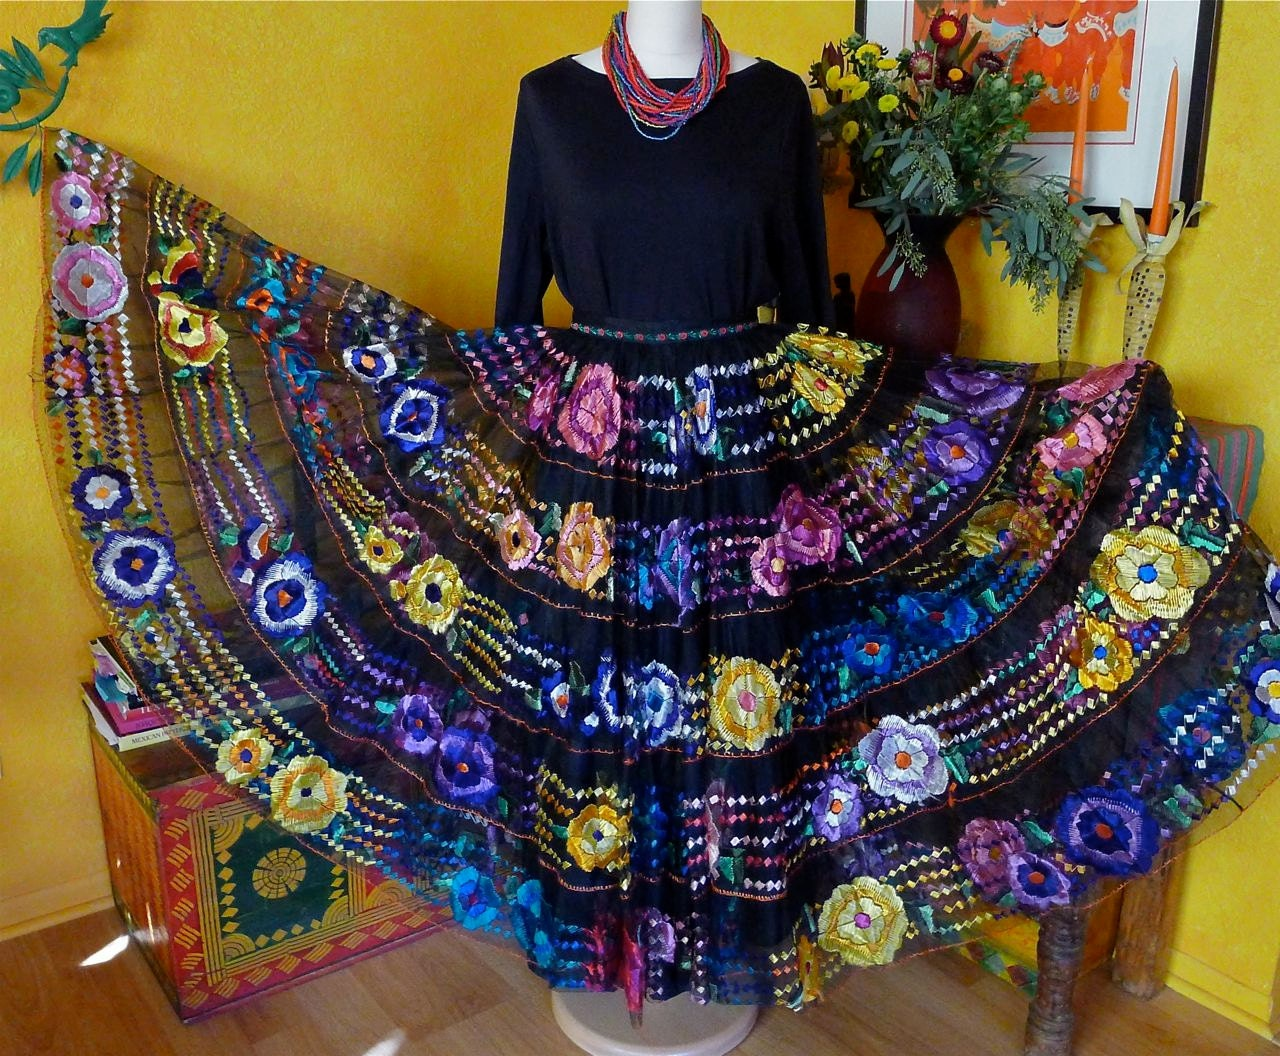 Reserve mexican embroidered skirt chiapa de corzo dance